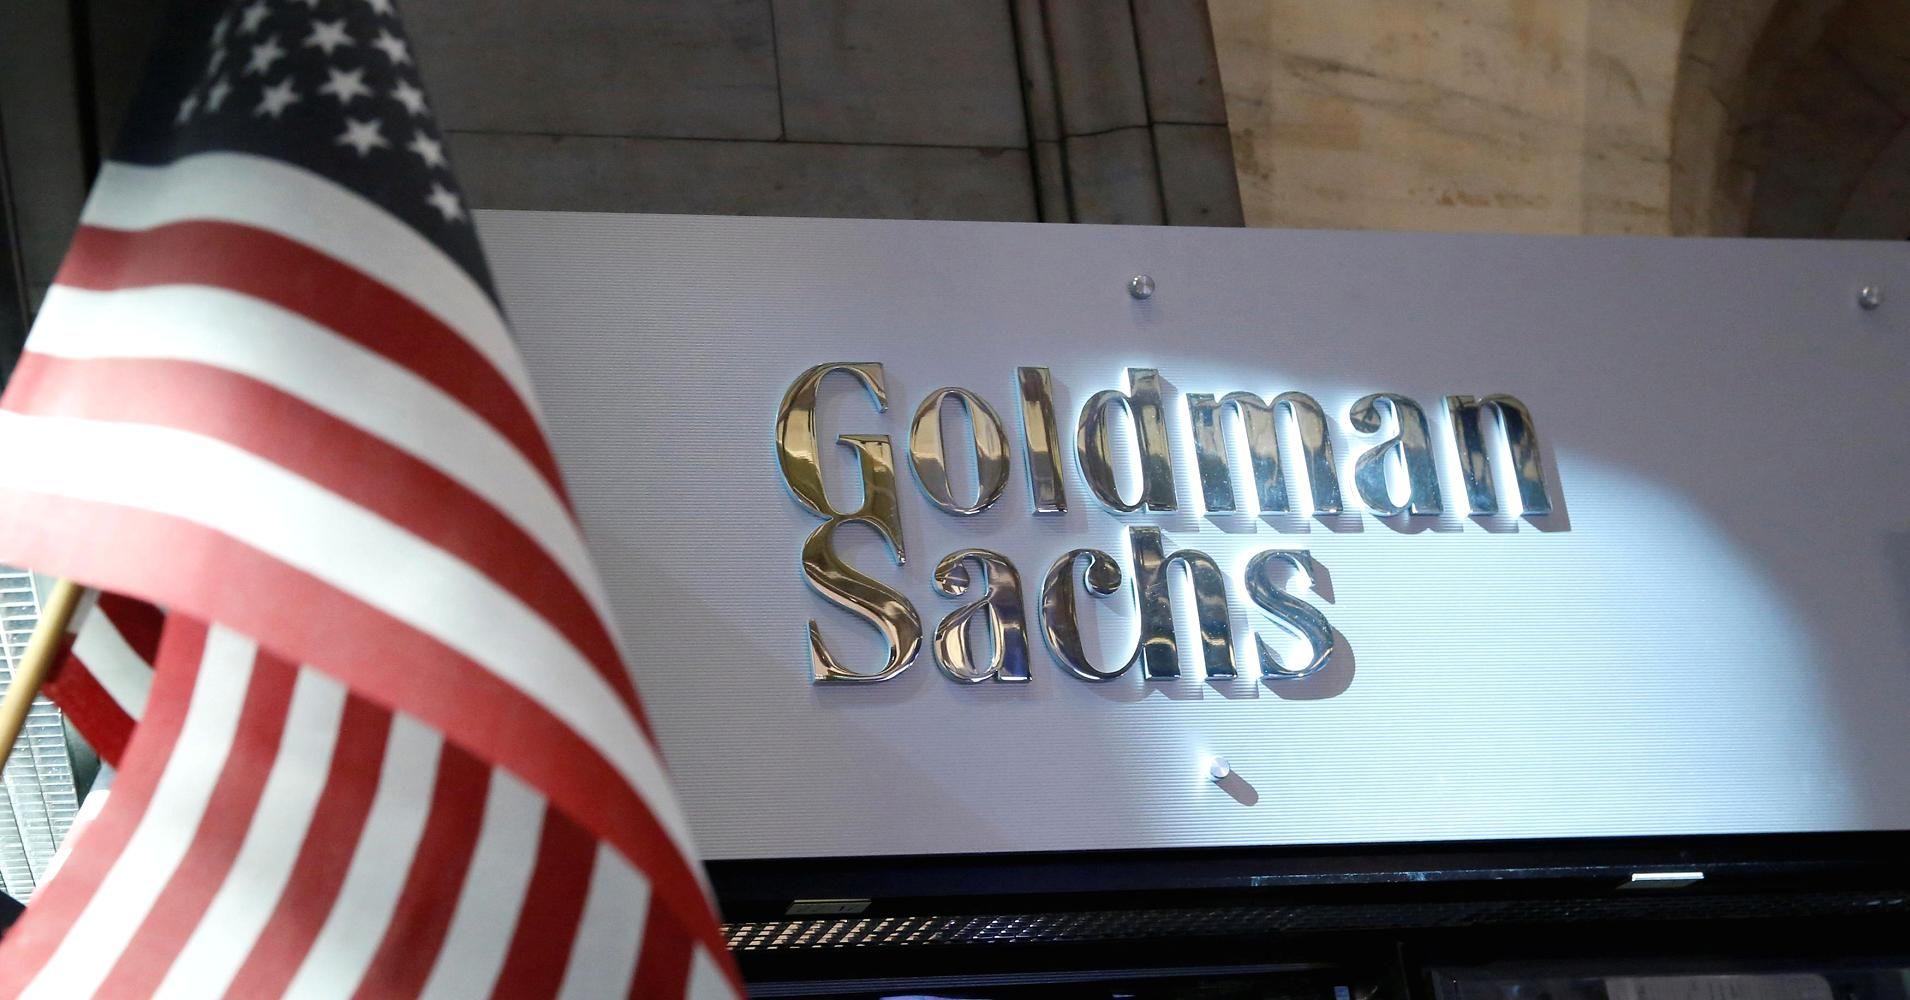 goldman sachs trading bitcoin)